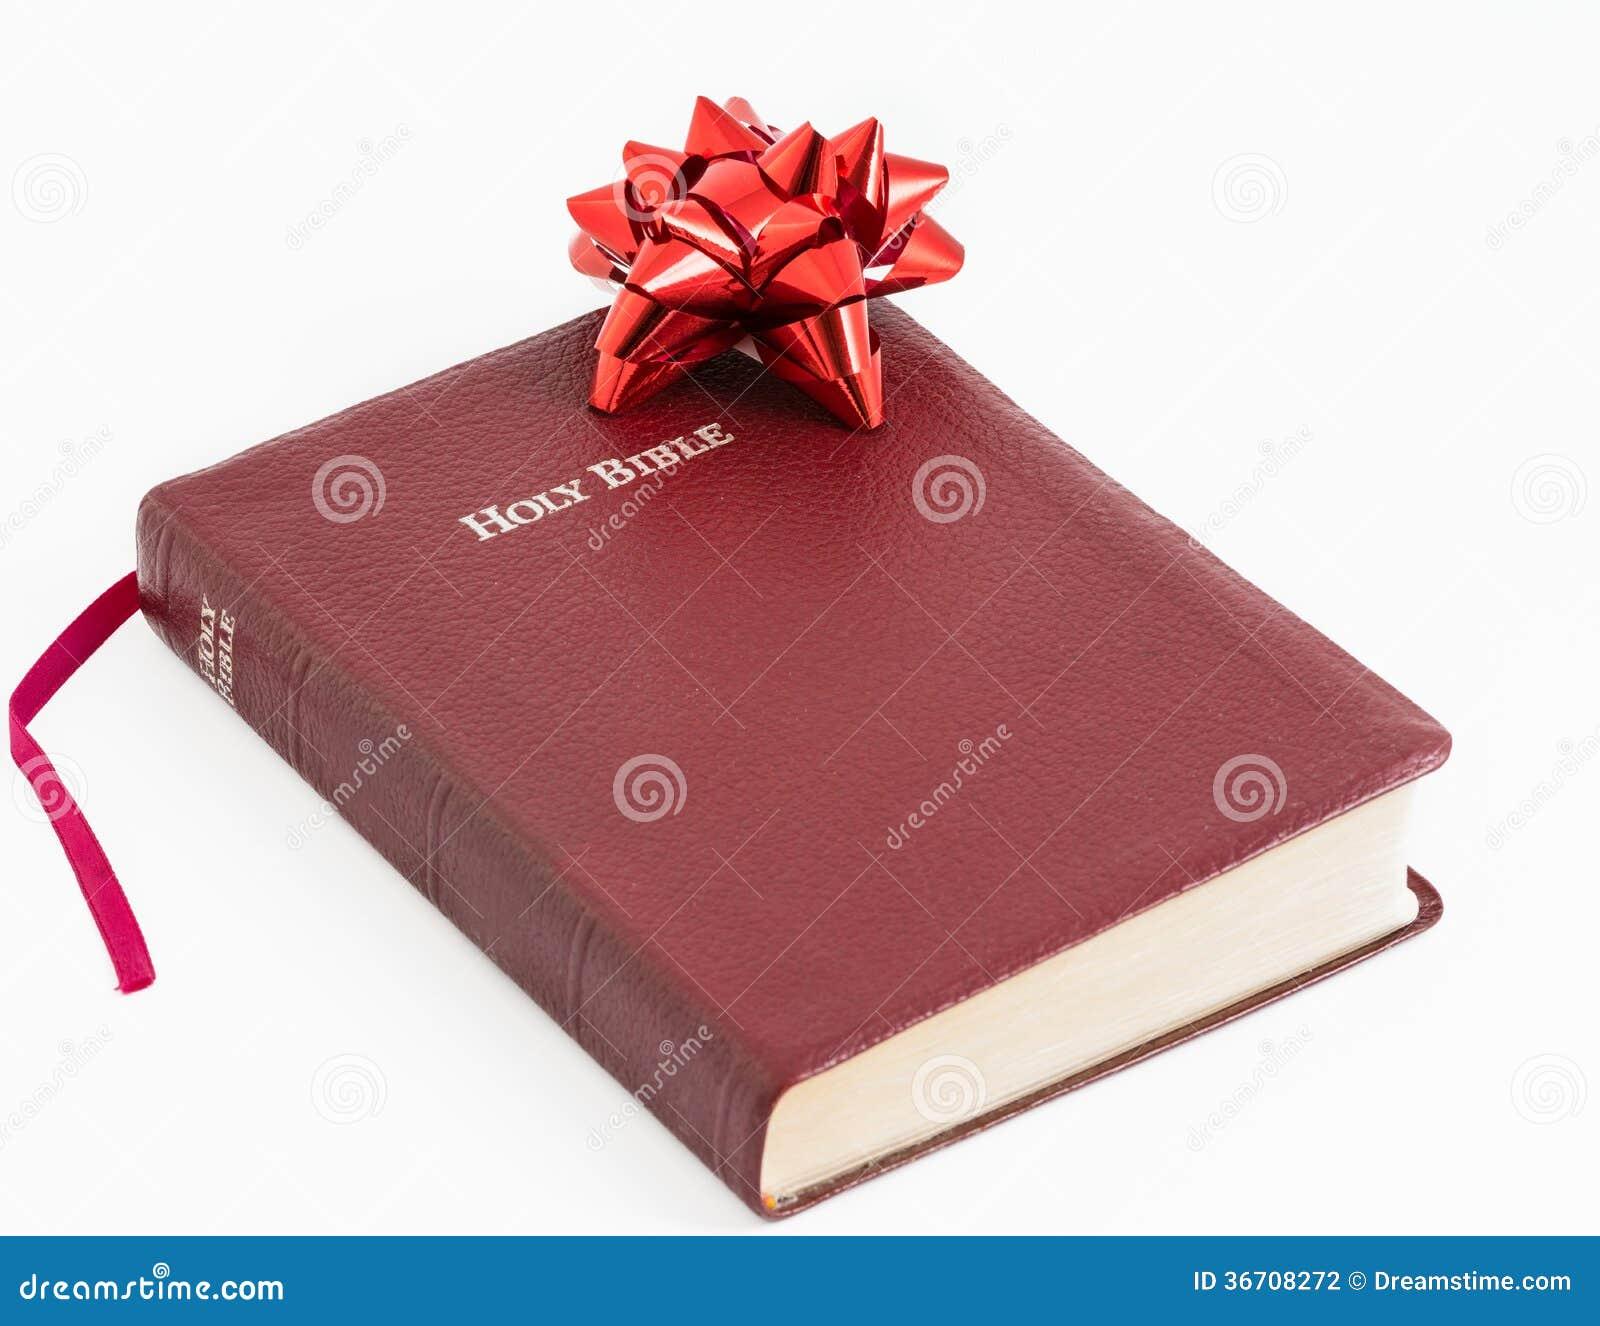 Spiritual Gift The Bible Word Of God As Valuable Present